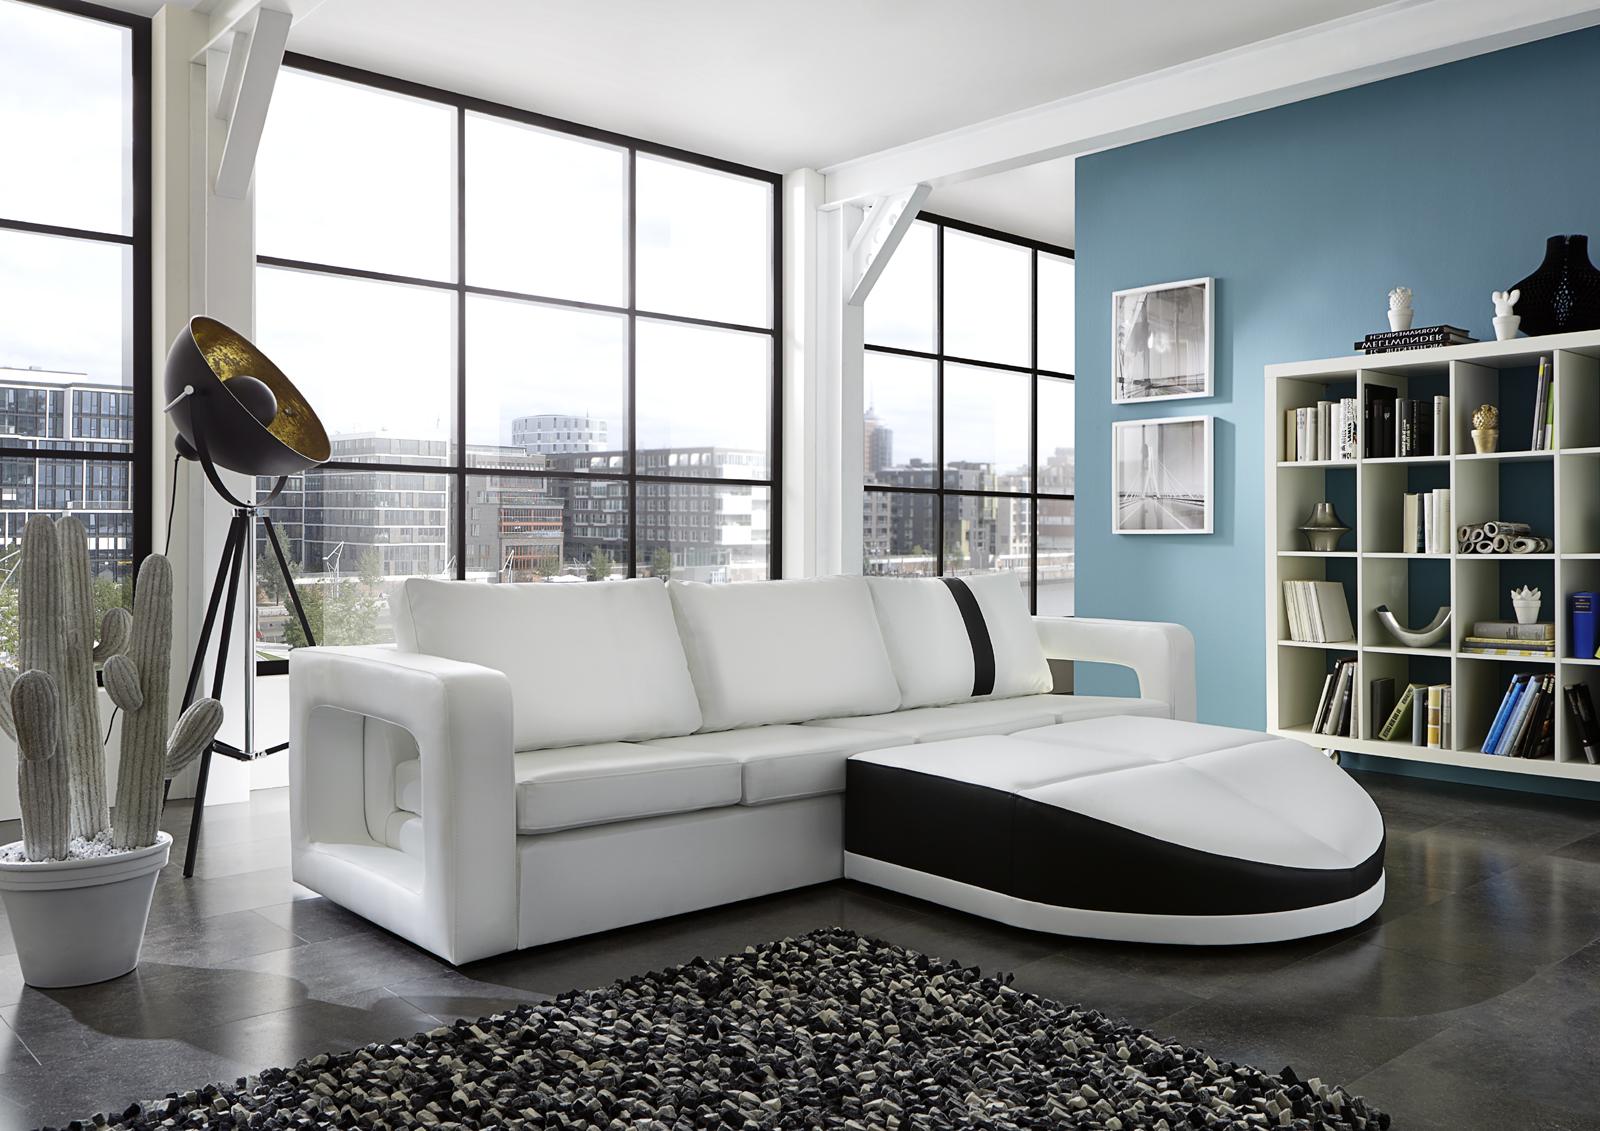 sam ecksofa wei schwarz sofa doccia 274 x 200 cm. Black Bedroom Furniture Sets. Home Design Ideas